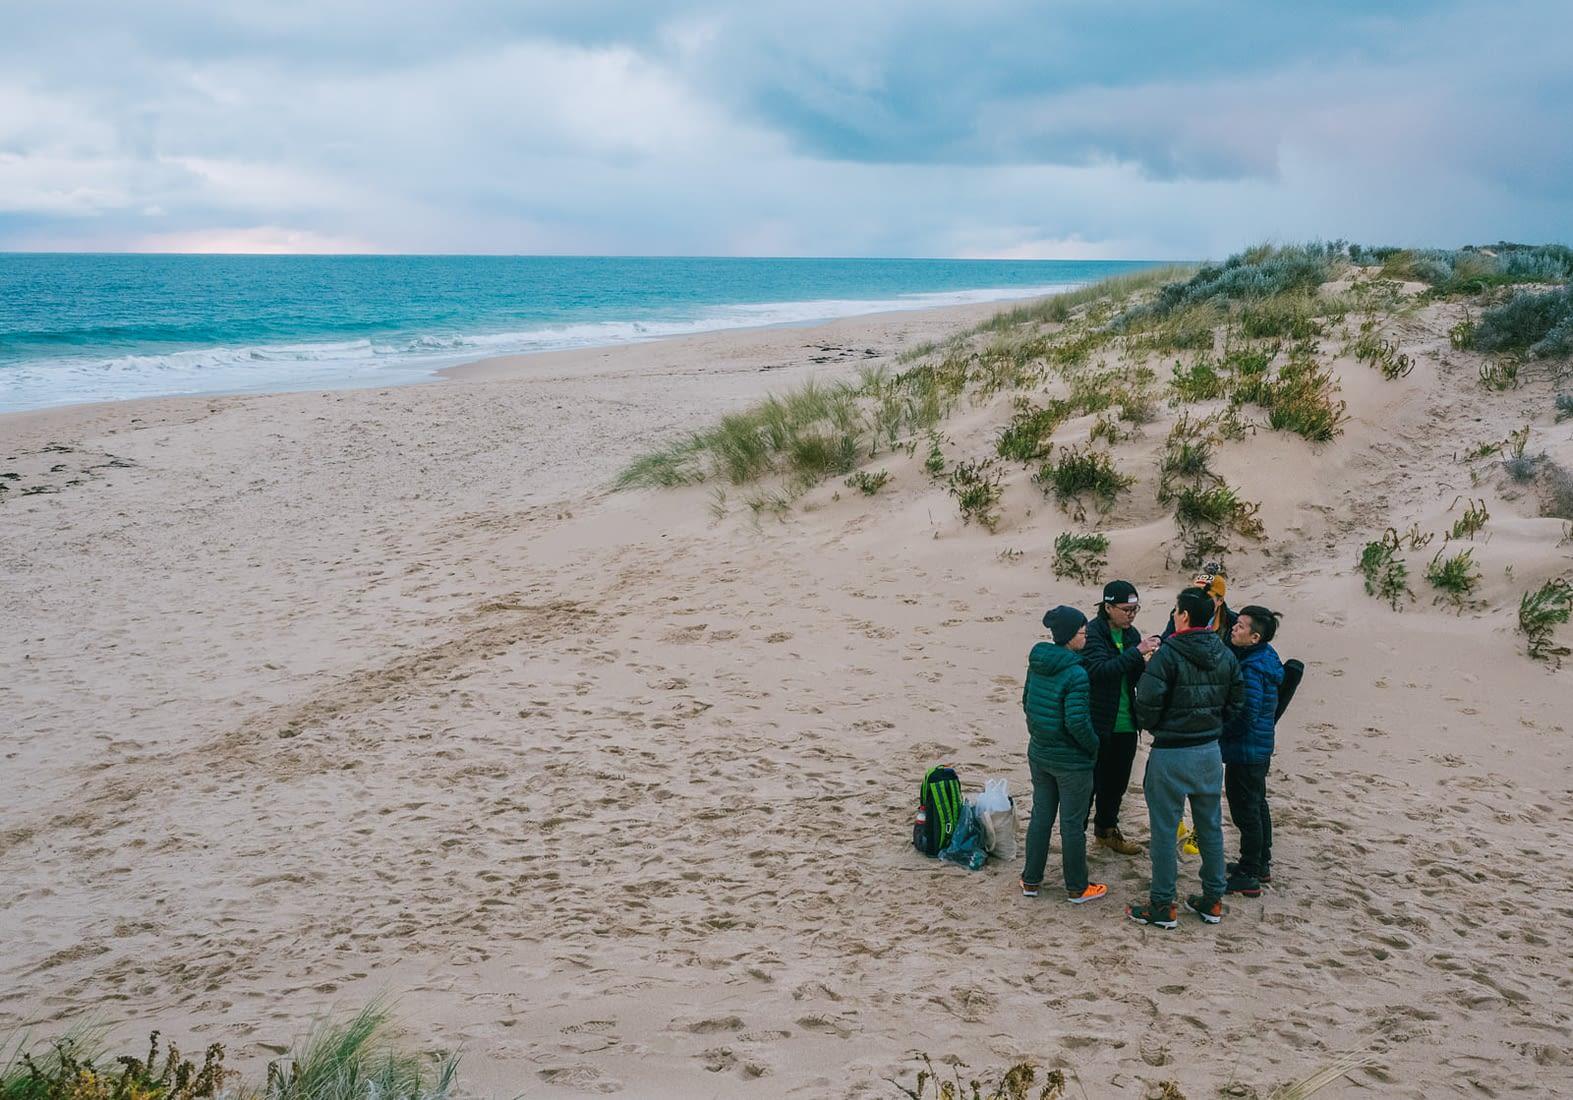 Perth, Australia - Eating at Preston beach